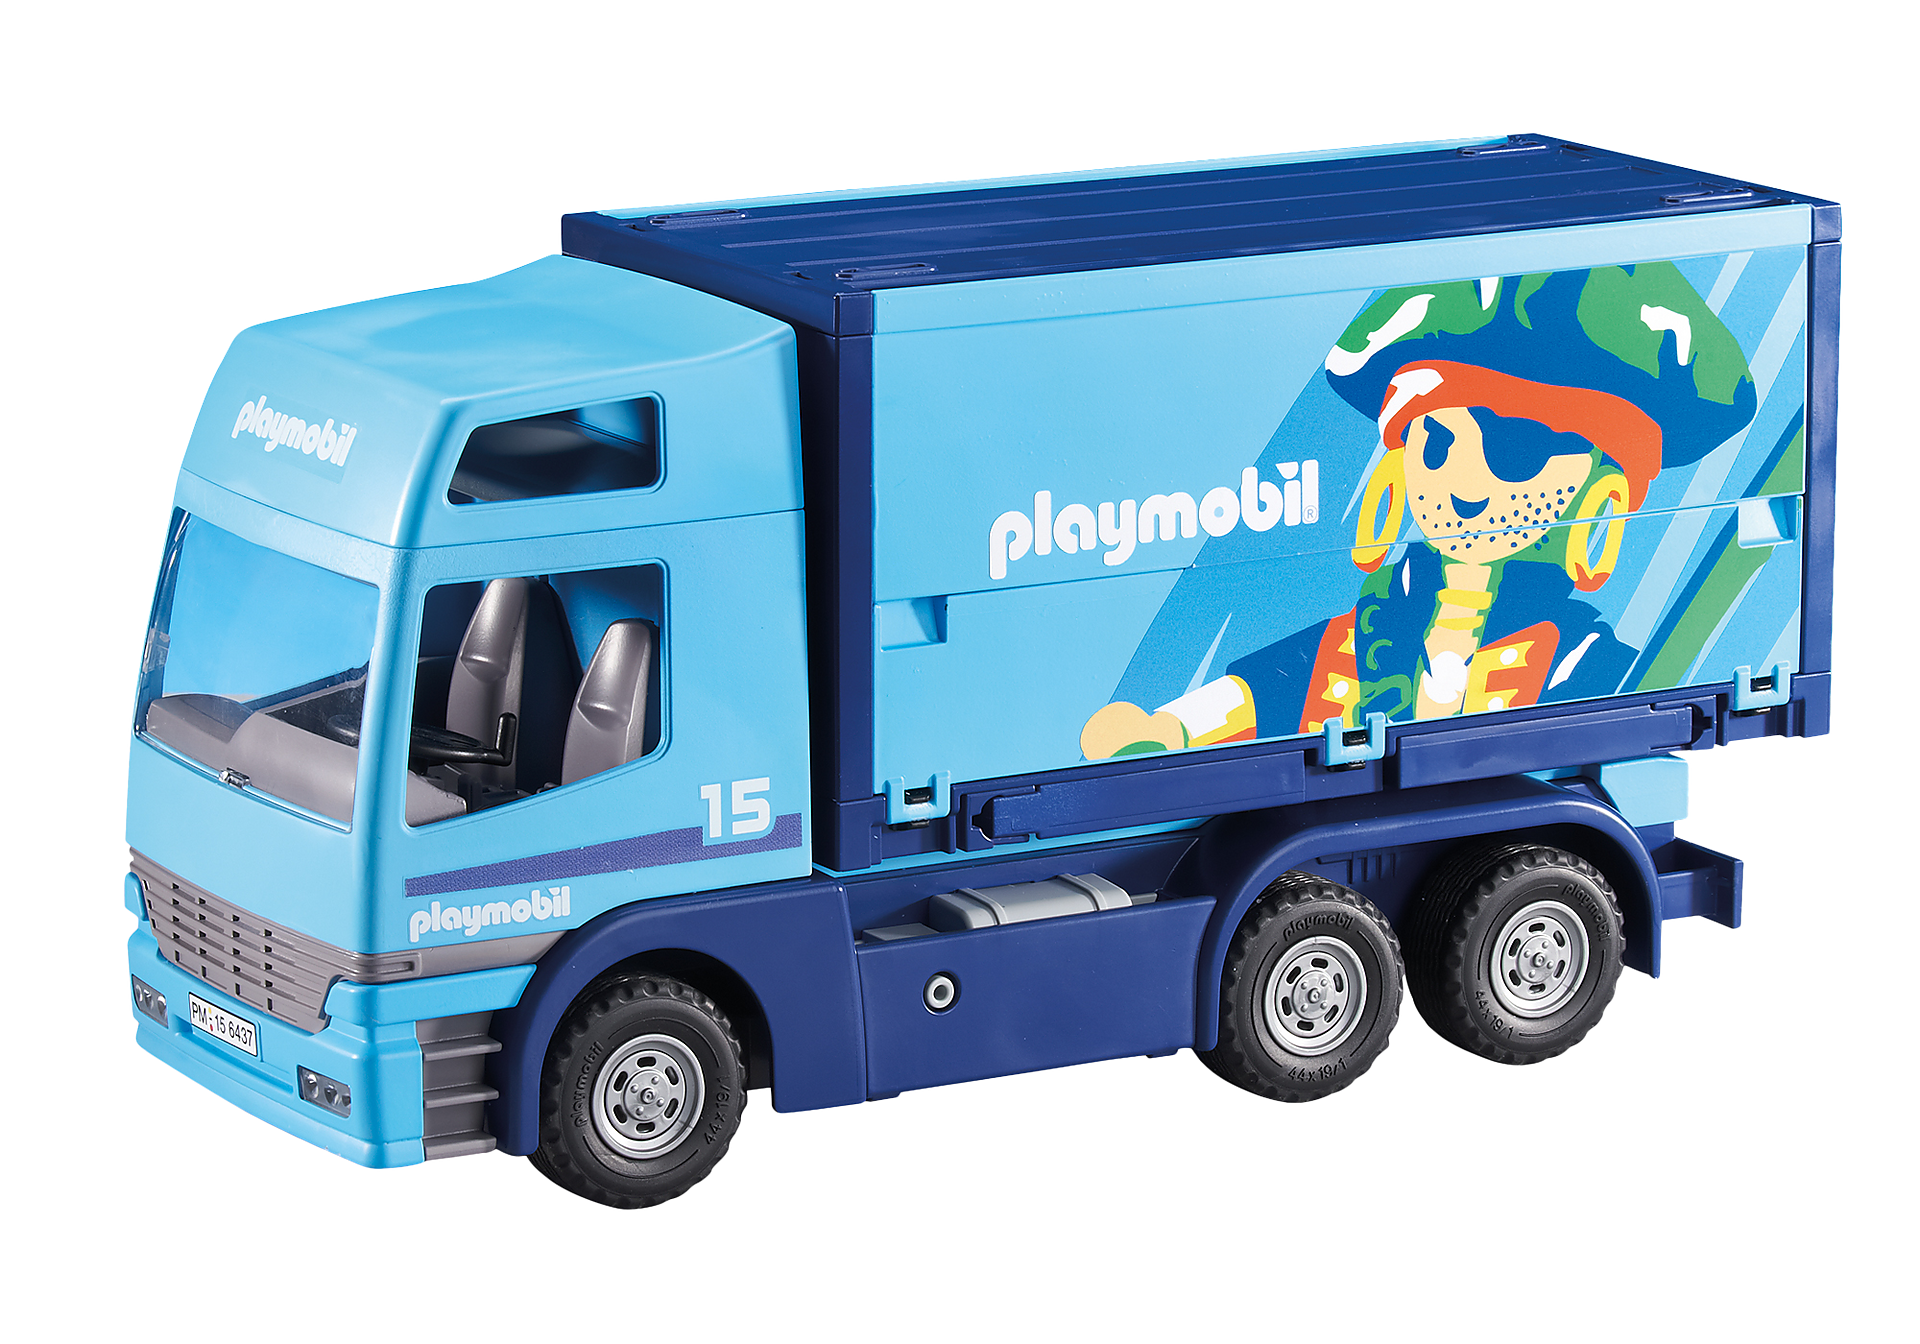 6437 PLAYMOBIL Truck zoom image1